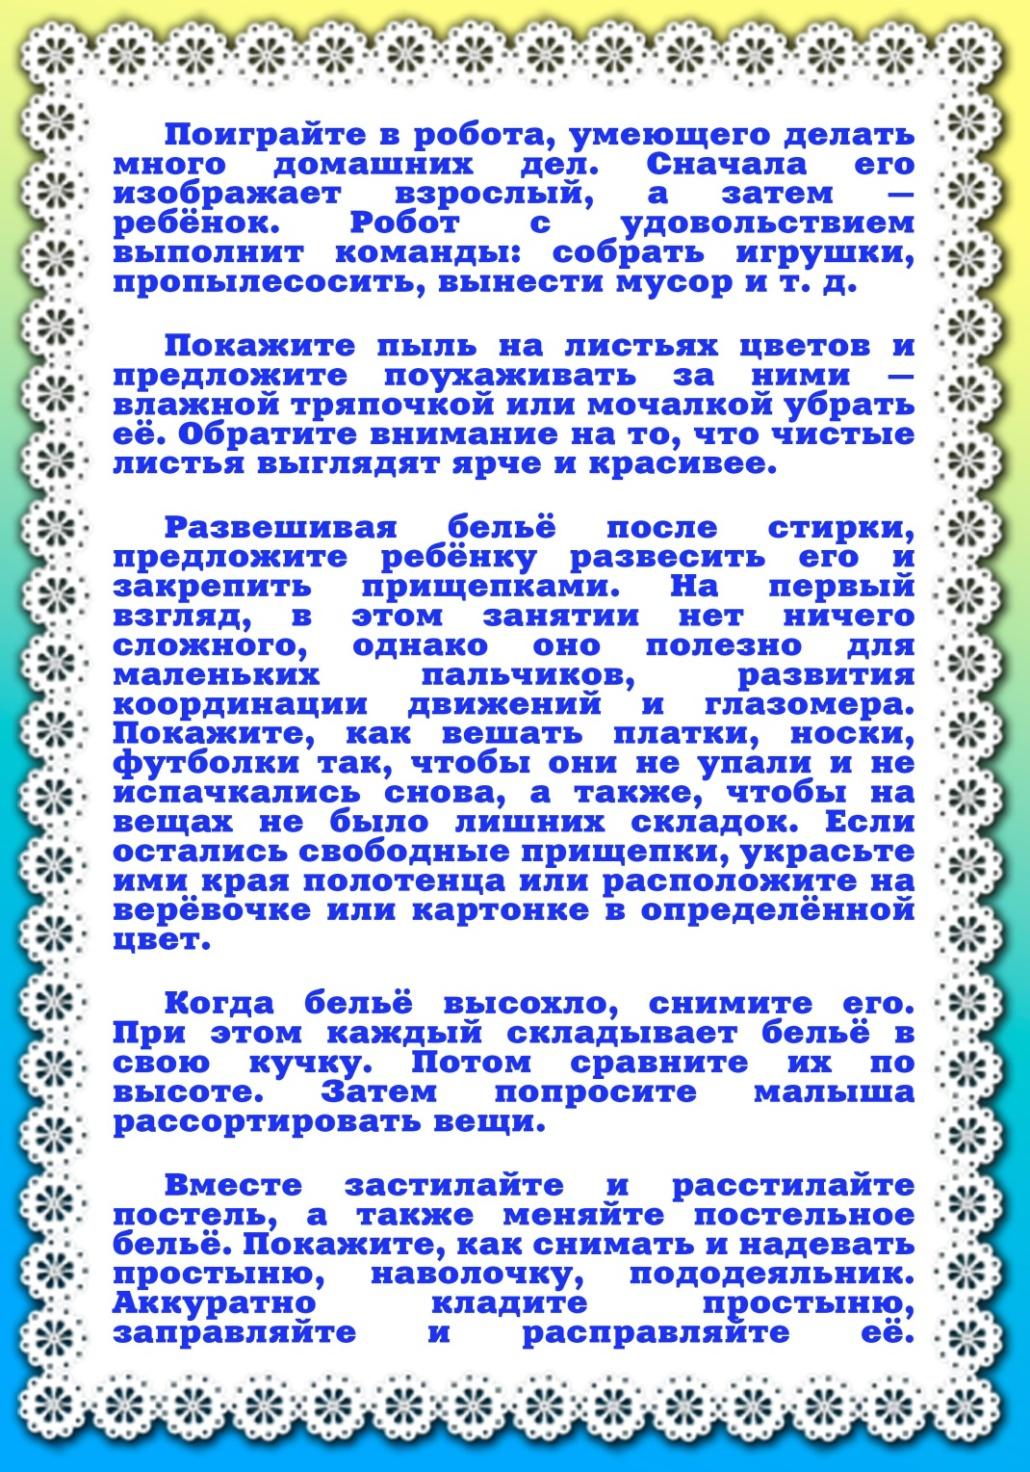 hello_html_m6f313713.jpg